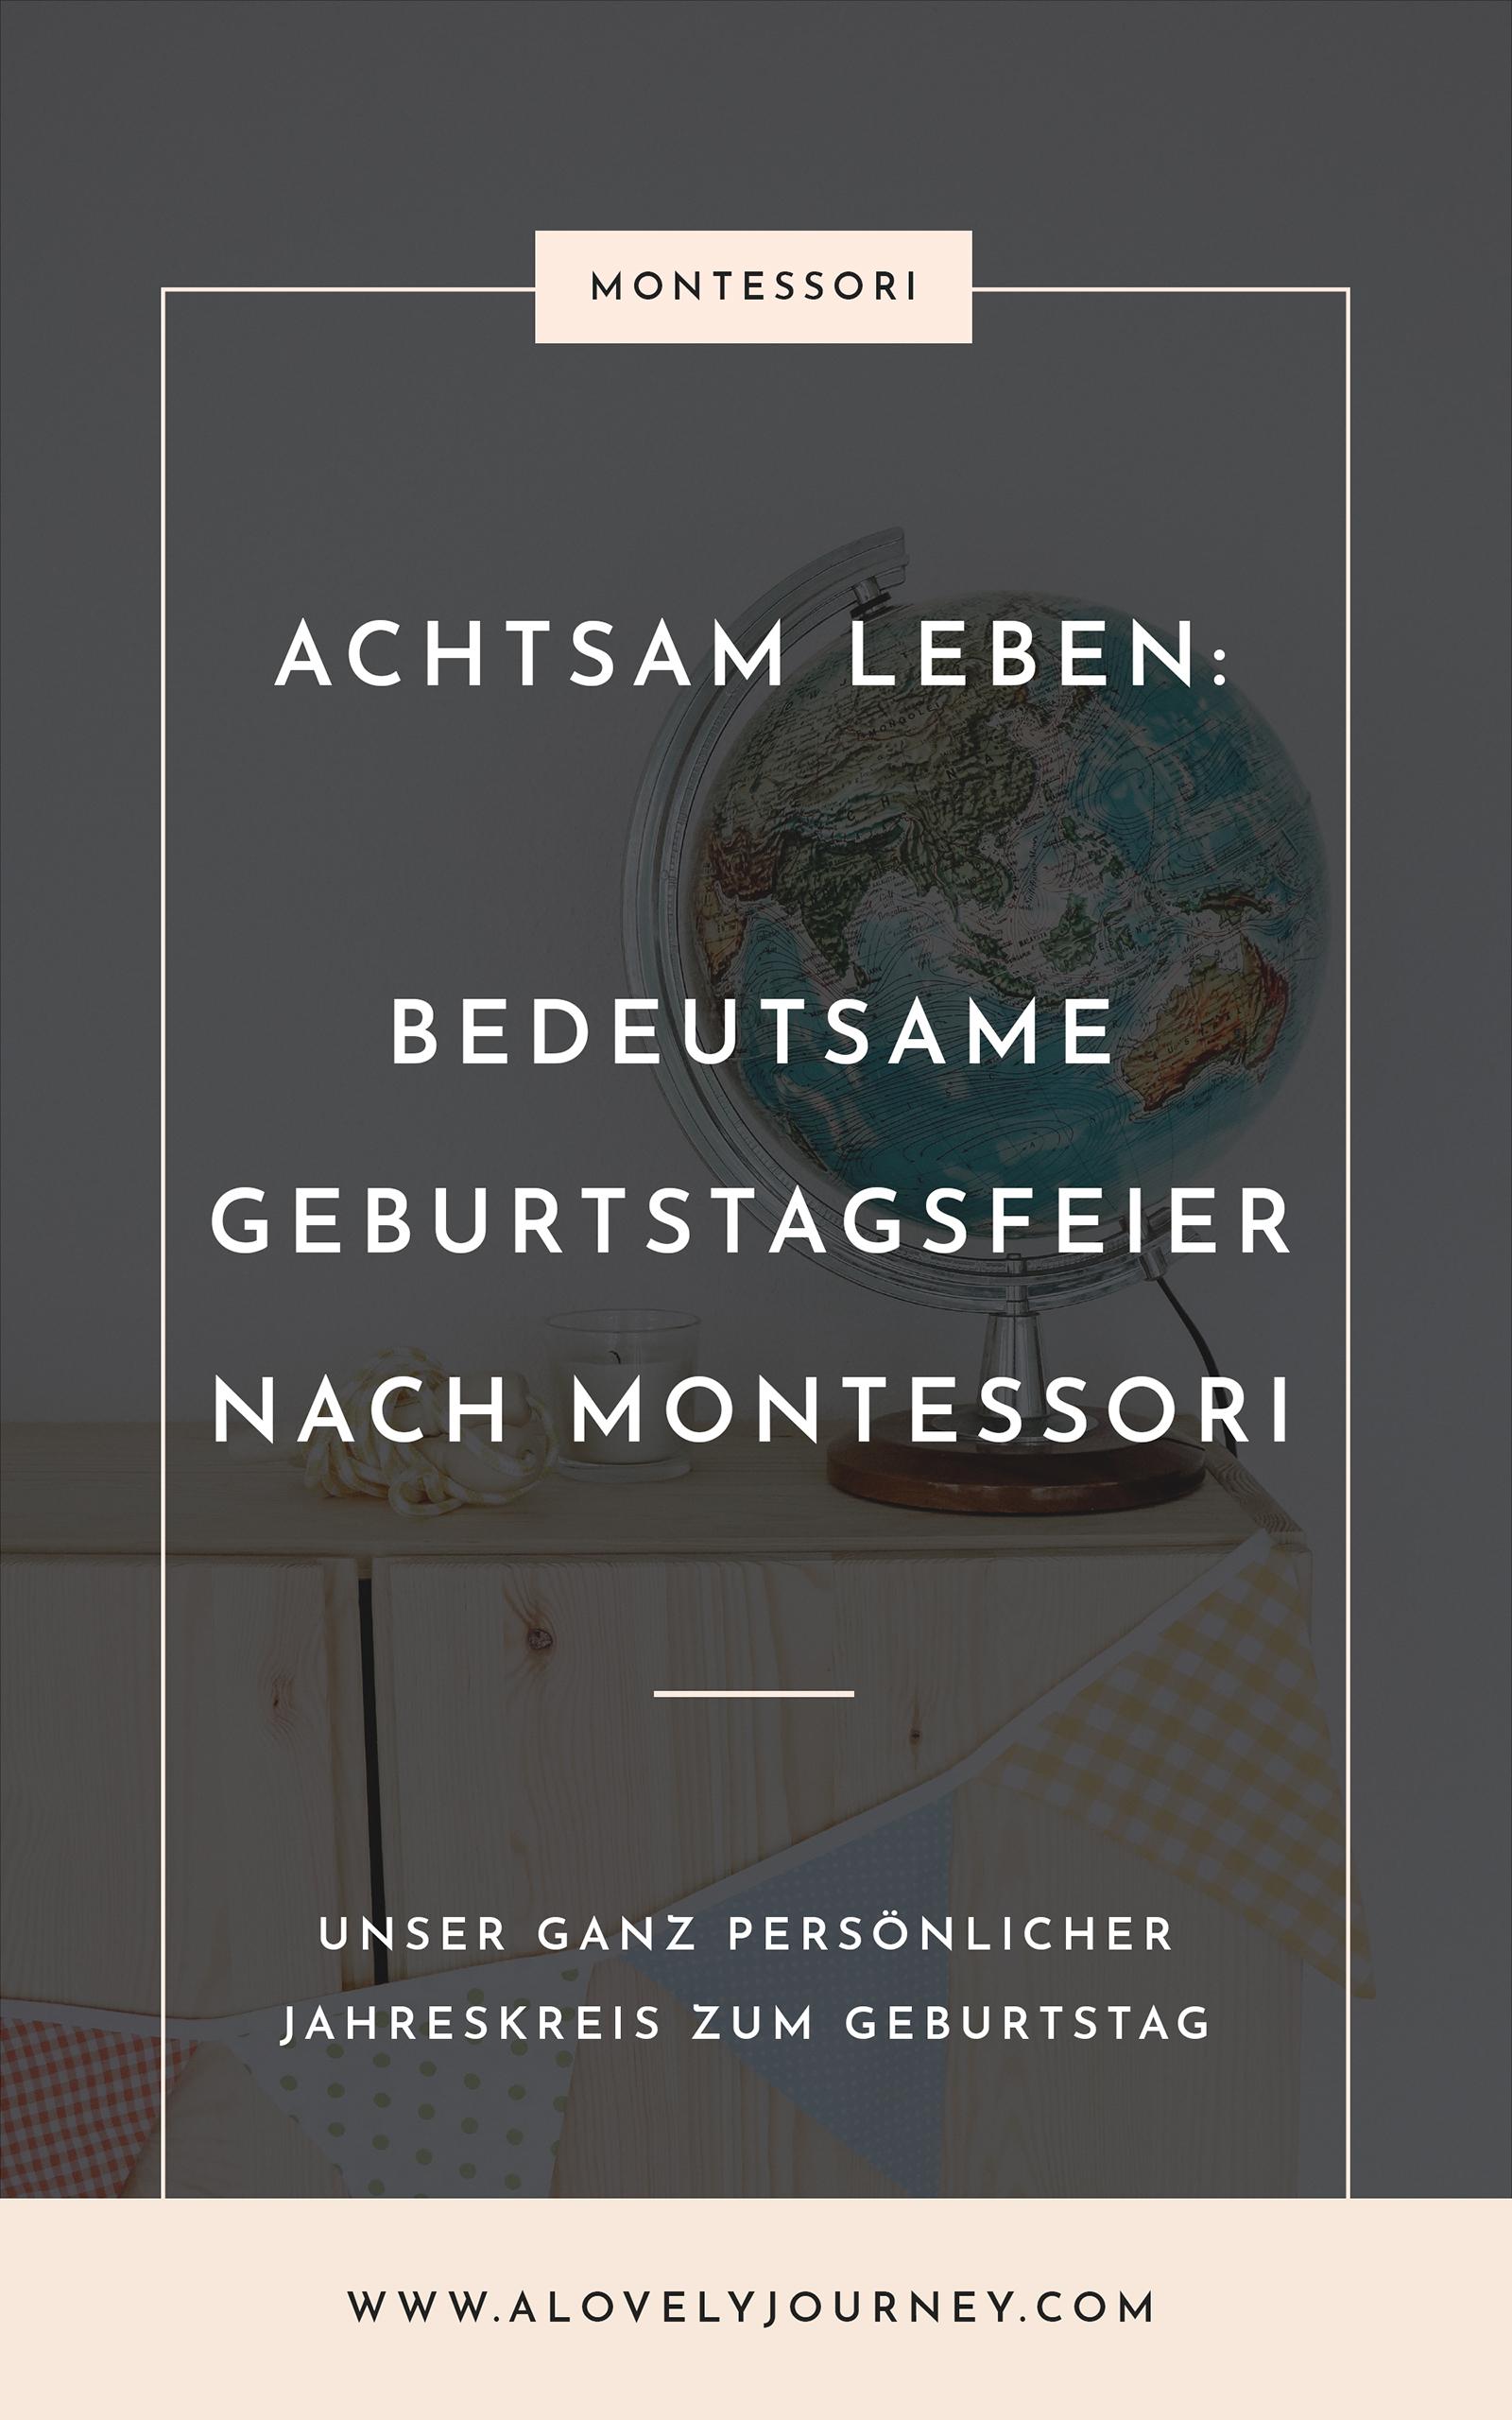 Achtsam Feiern: Geburtstag feiern nach Montessori